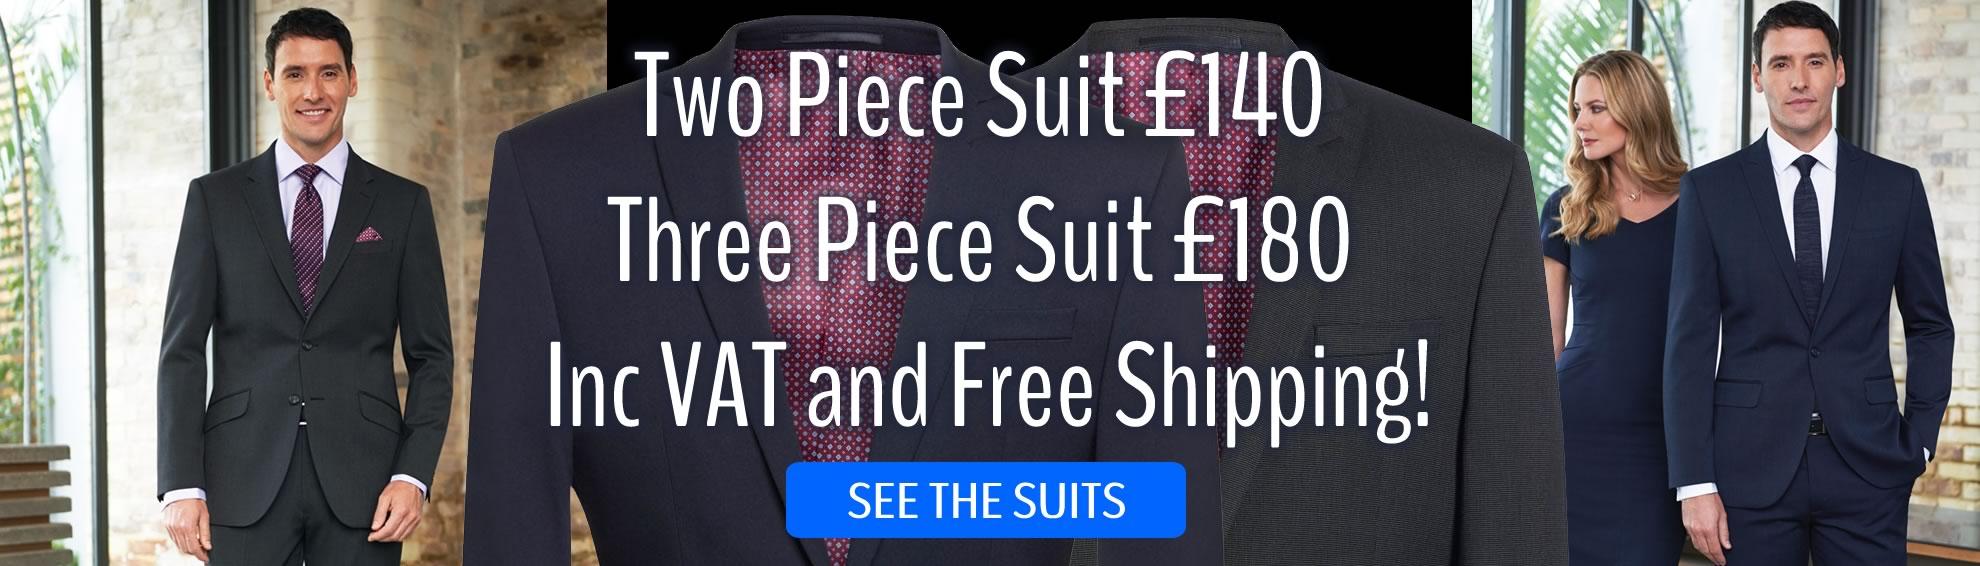 All In Suit Deals